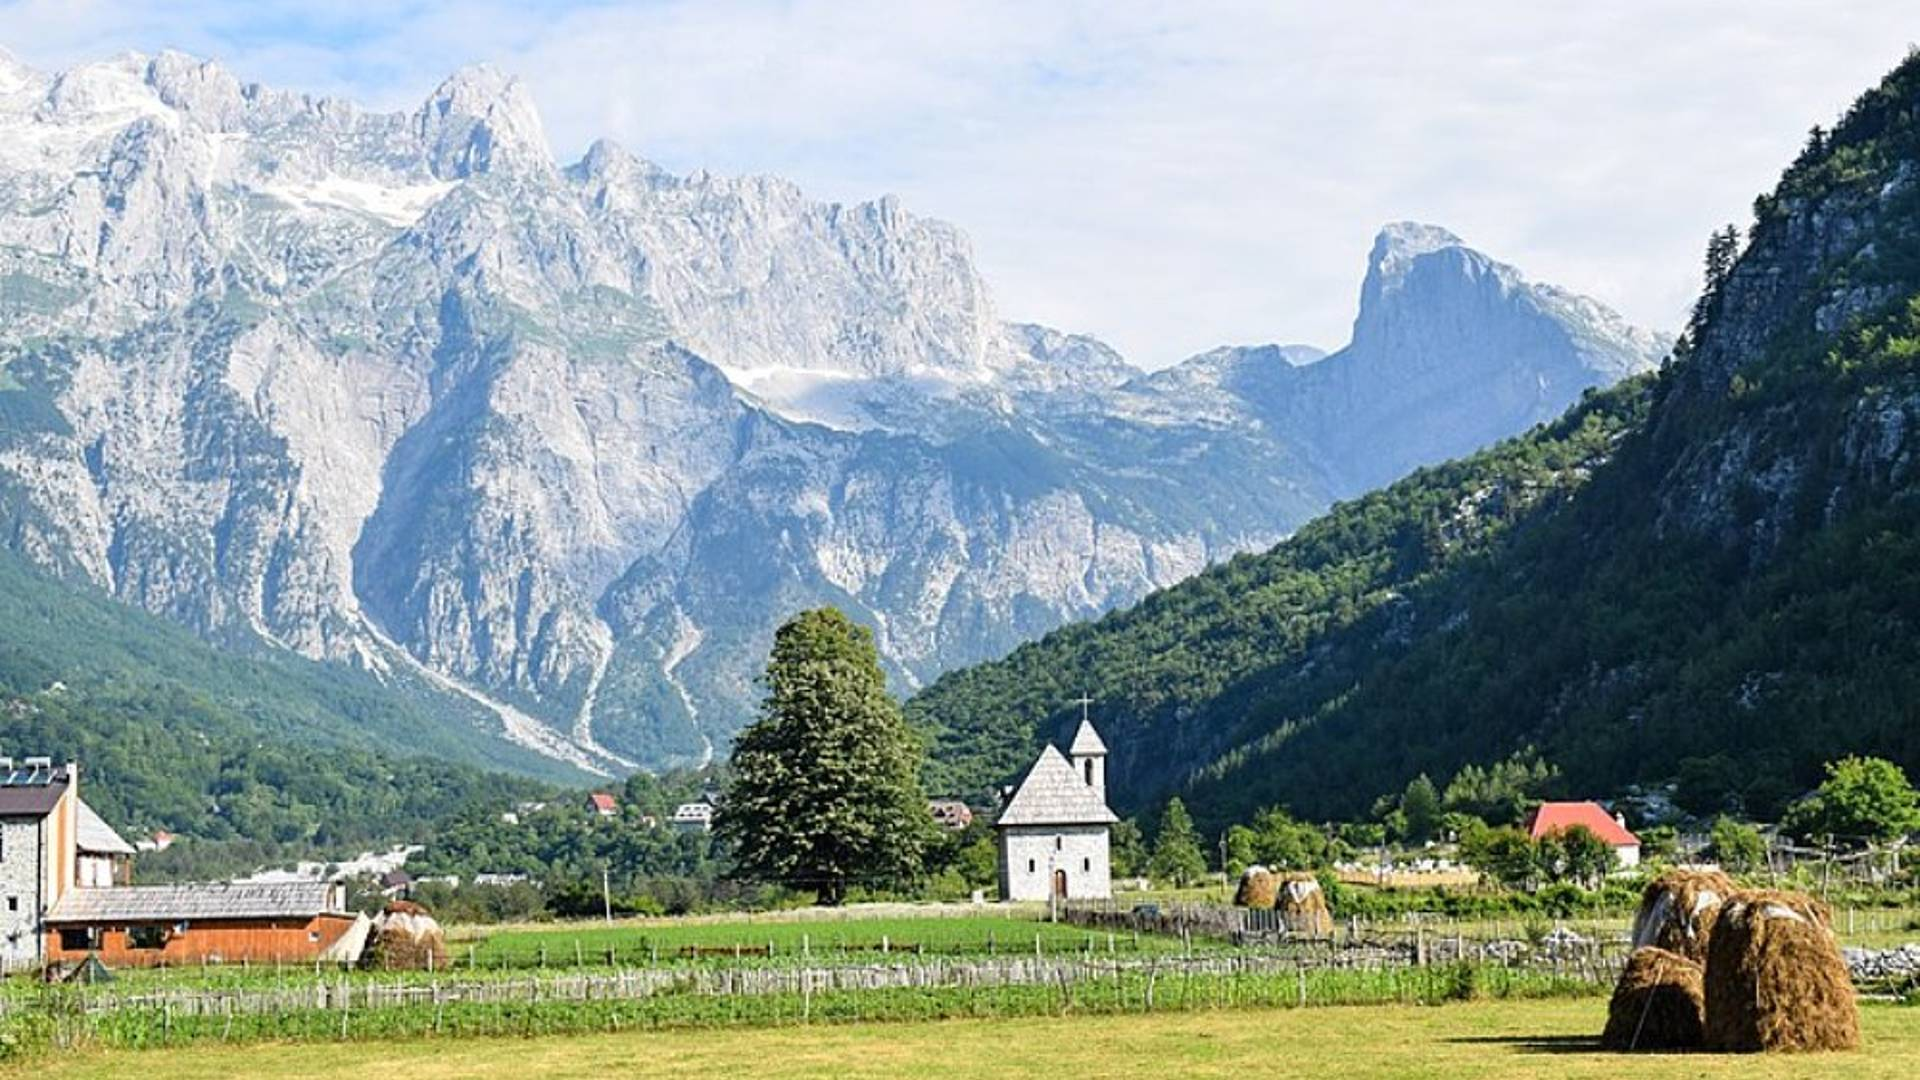 Koman, Valbona e Theth, 3 giorni tra le alpi albanesi